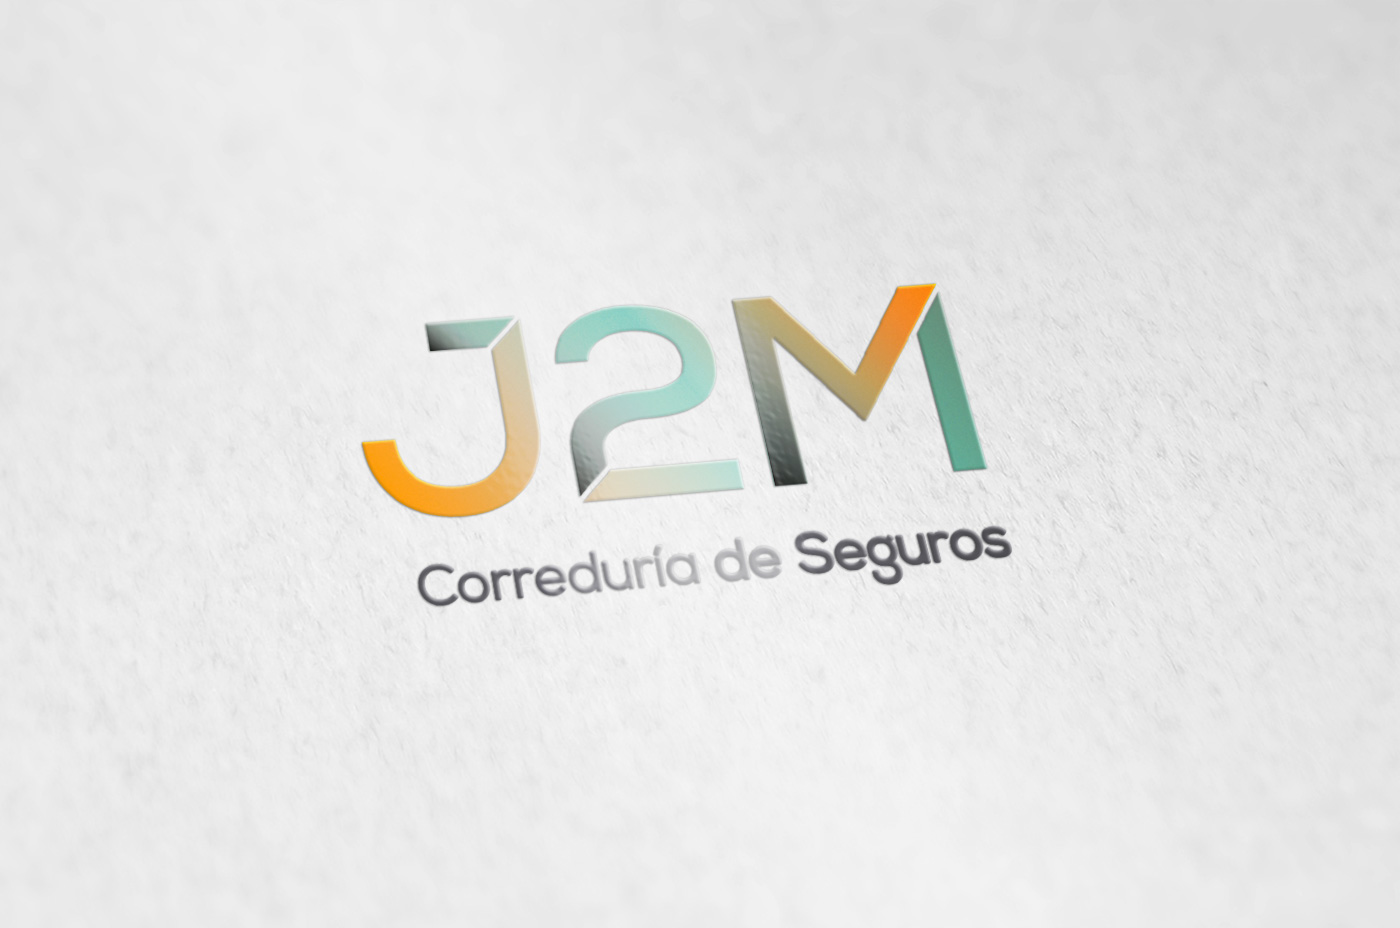 Diseño grafico Albacete, branding Albacete, imprenta, J2M seguros